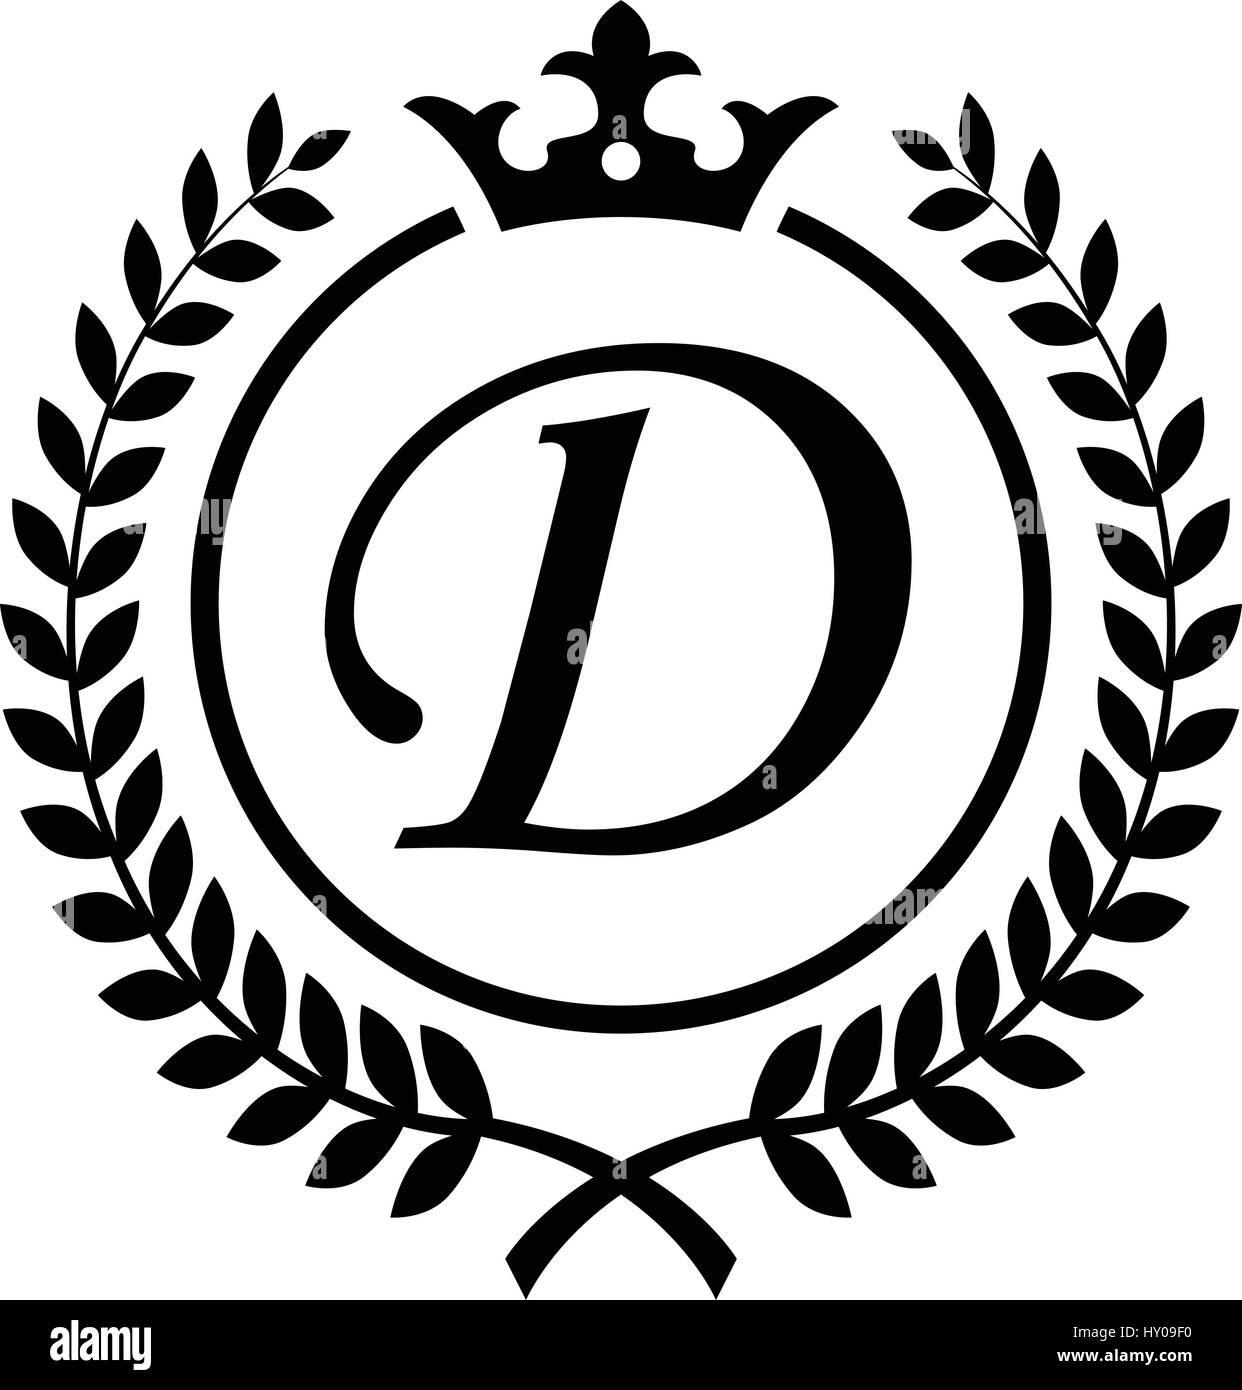 371ea96d Vintage Letter D initial inside Laurel wreath symbol design - Stock Vector